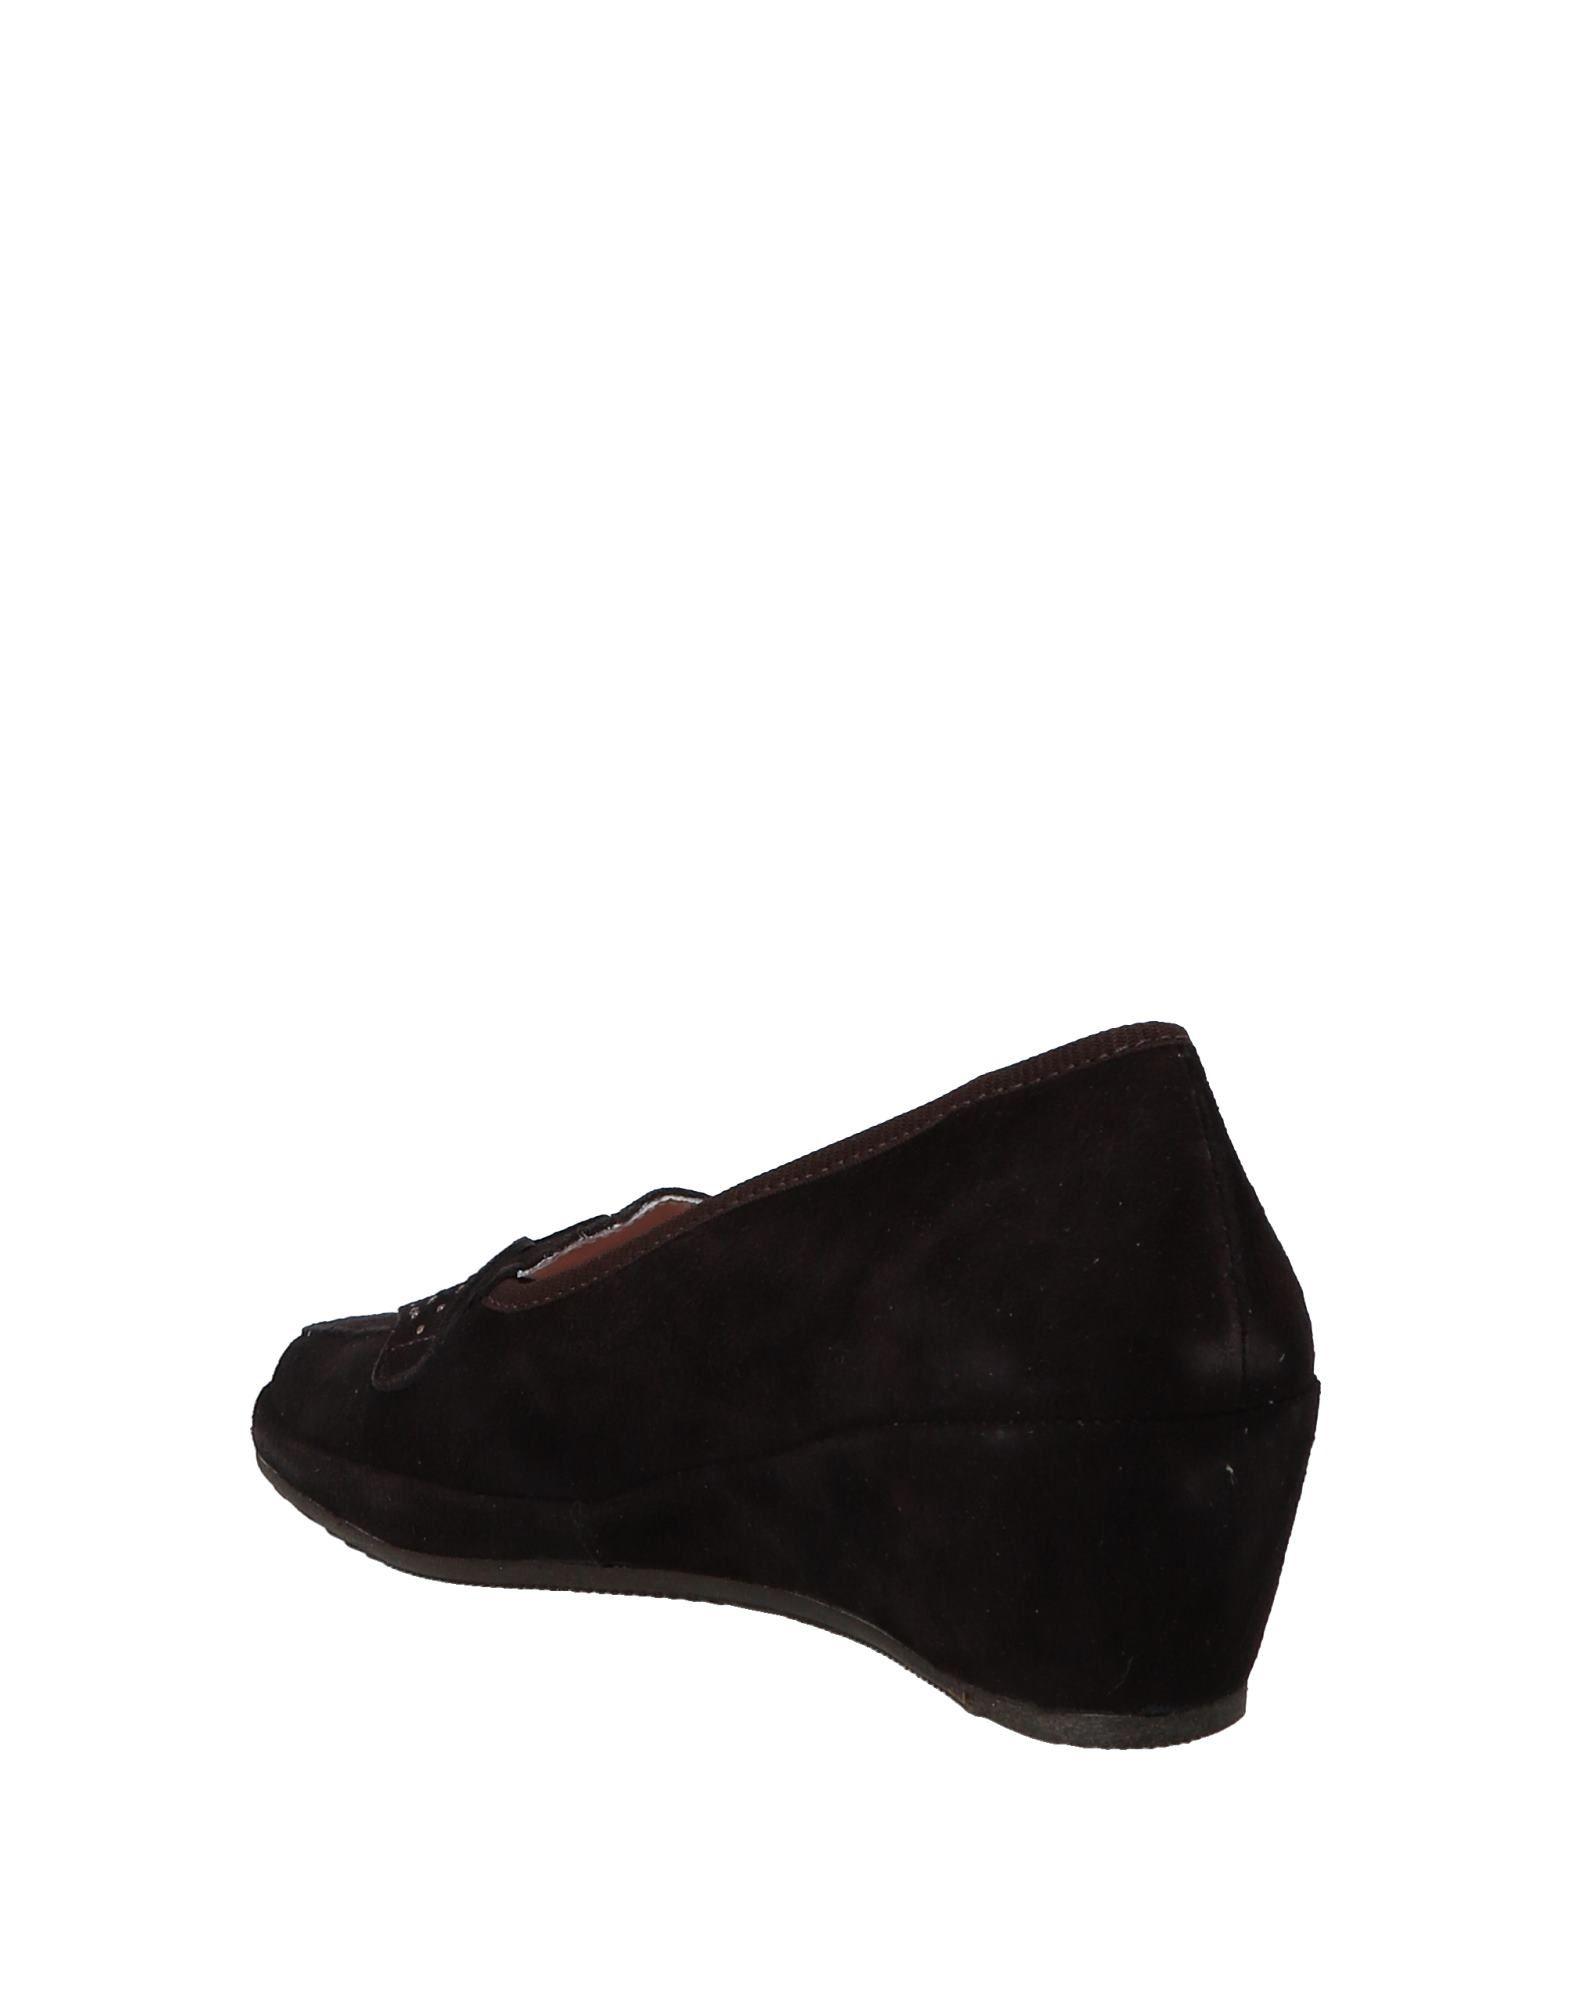 Susimoda Mokassins Damen  Qualität 11088575LA Gute Qualität  beliebte Schuhe cb425b